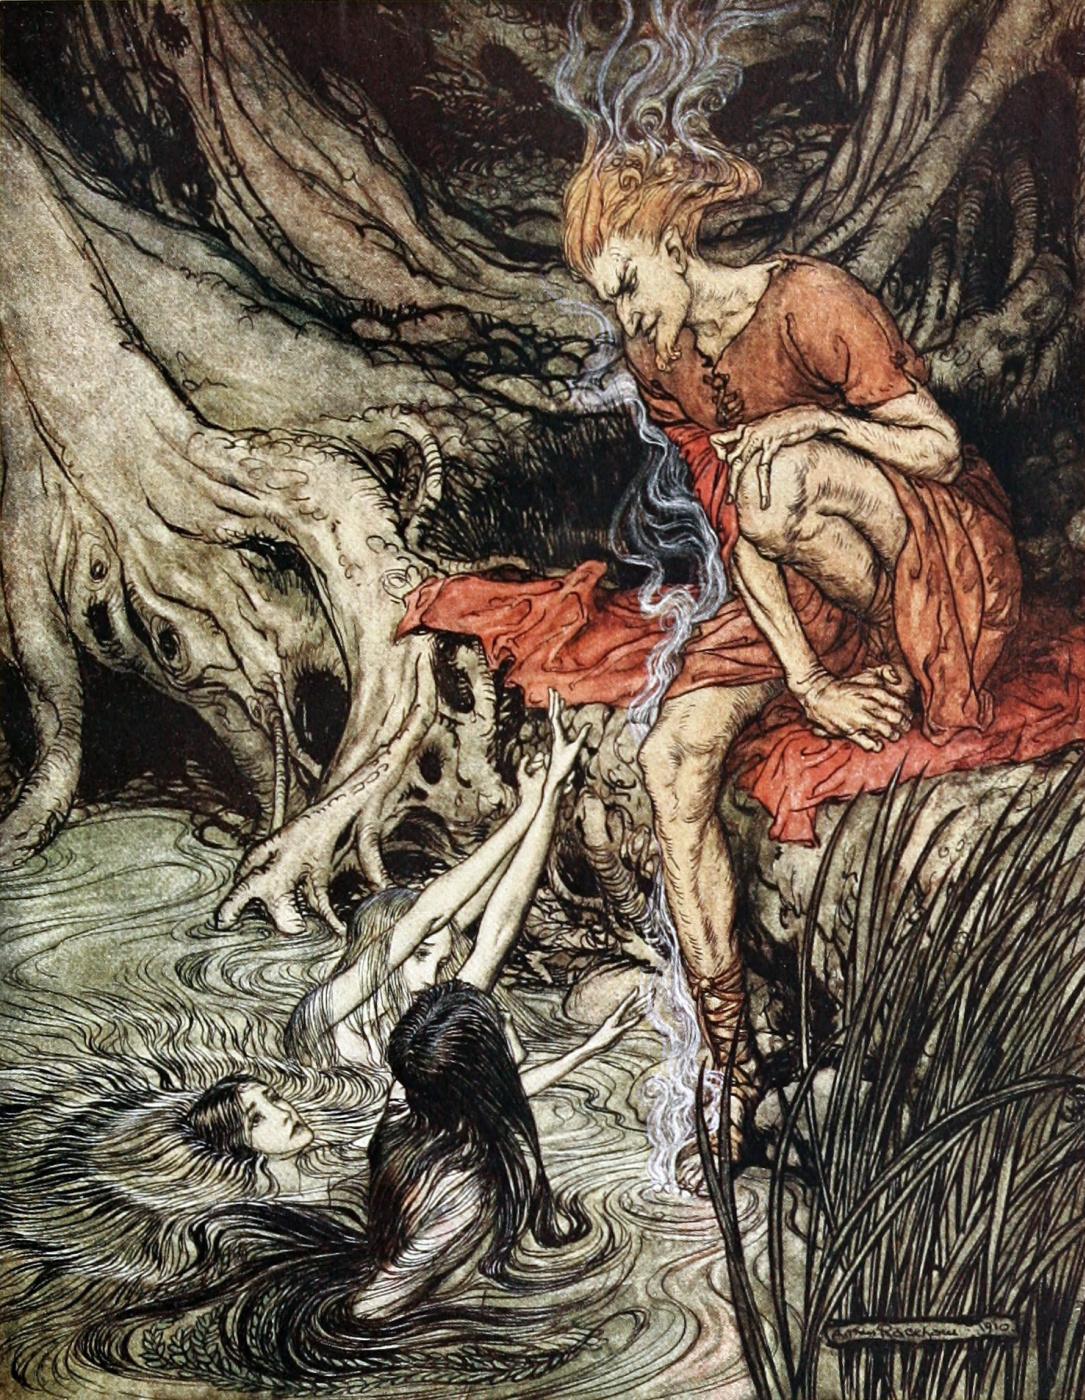 Arthur Rackham. The Rhine maidens ask for the help of God Loki